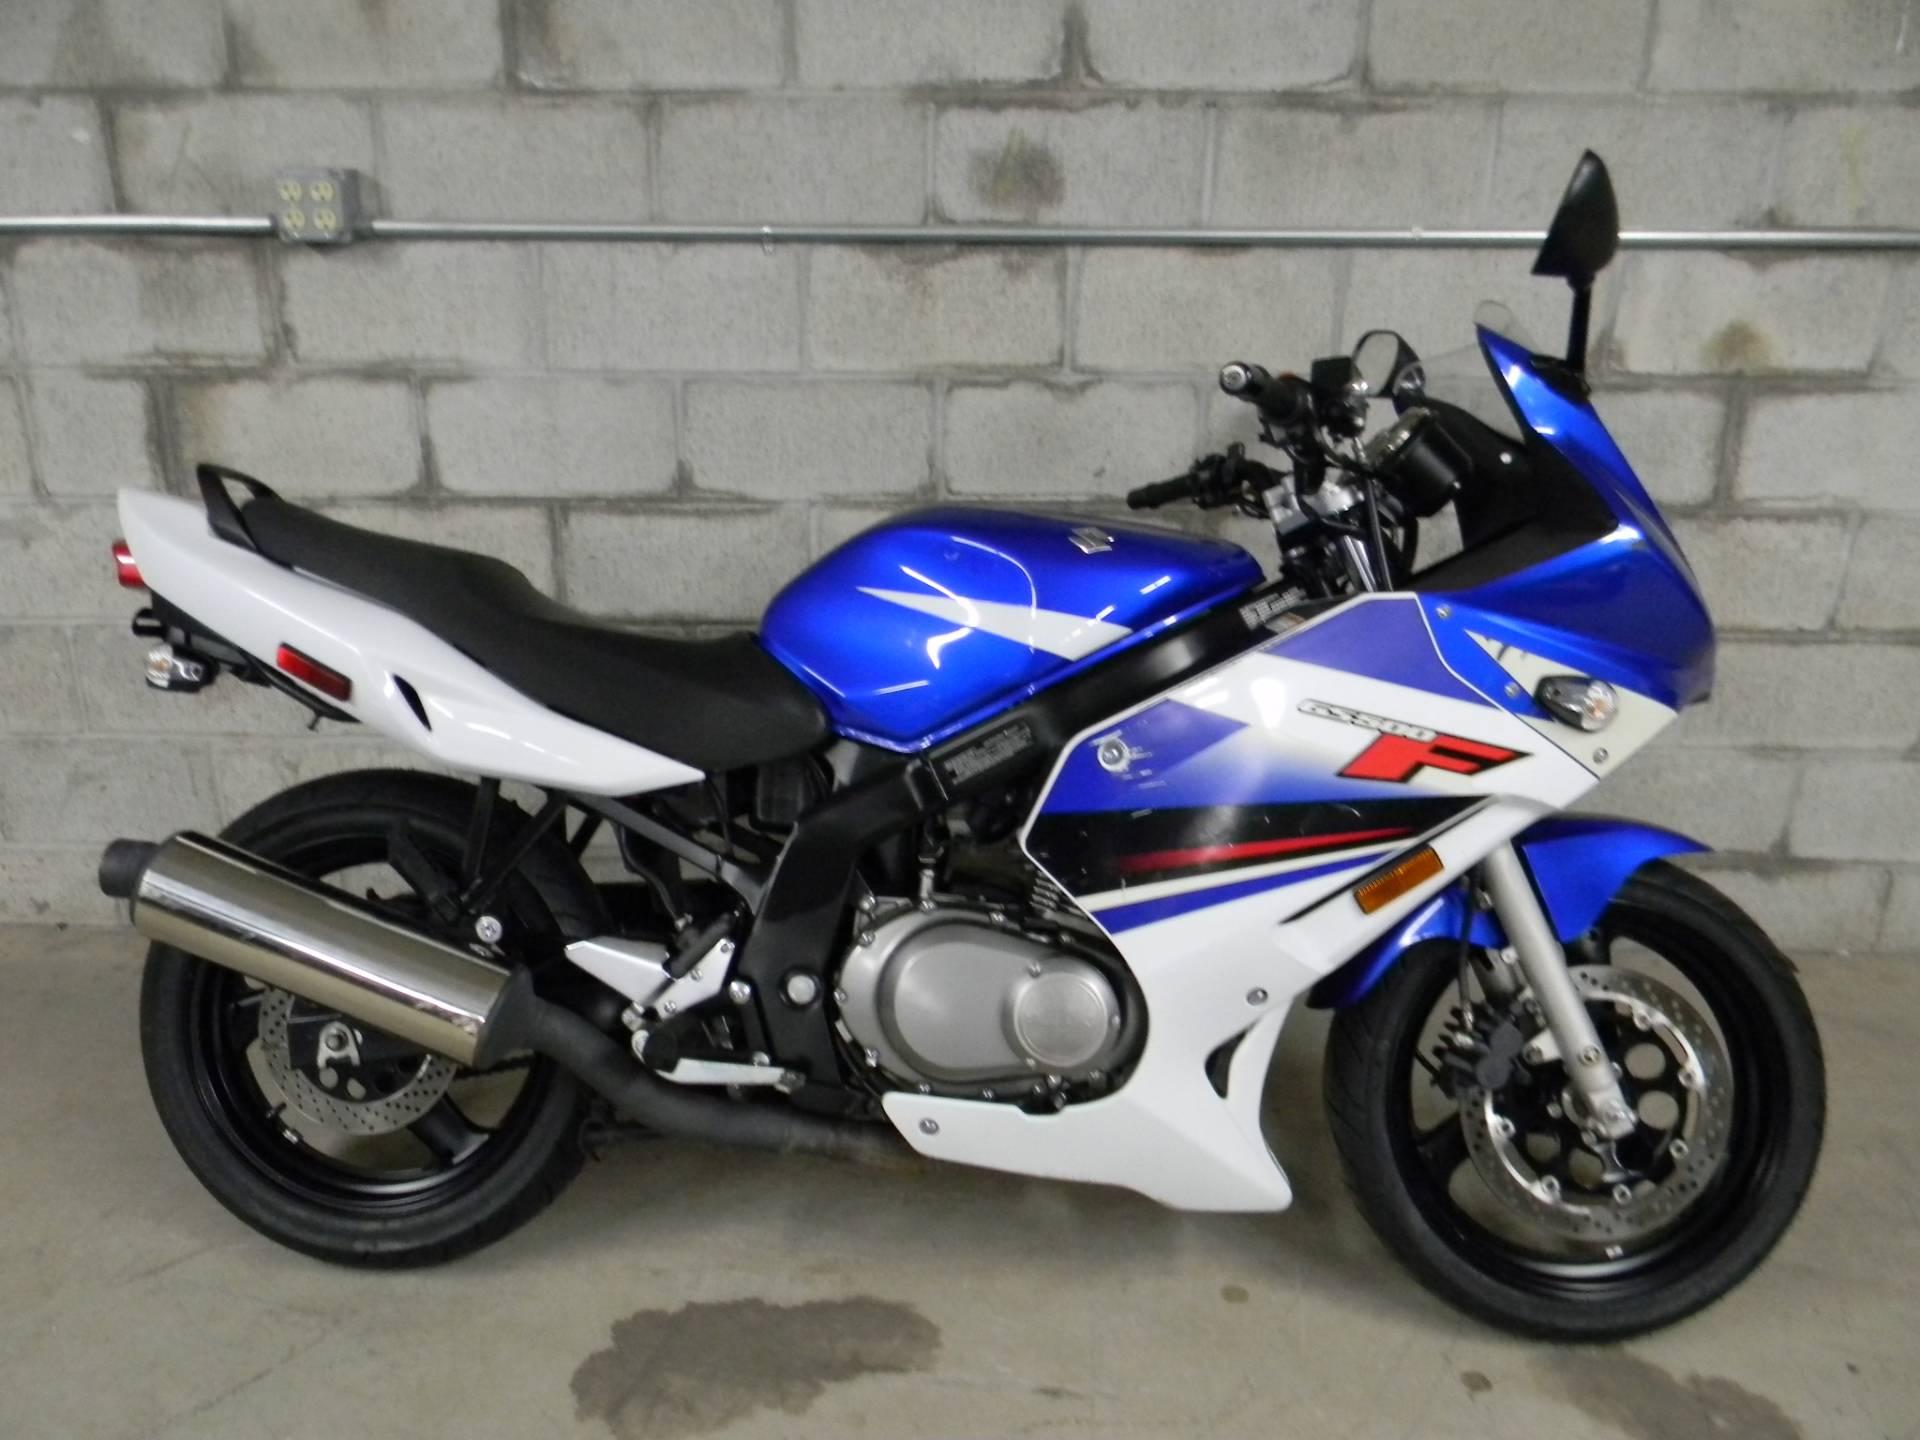 2009 Suzuki GS500F Motorcycles Springfield Massachusetts N/A